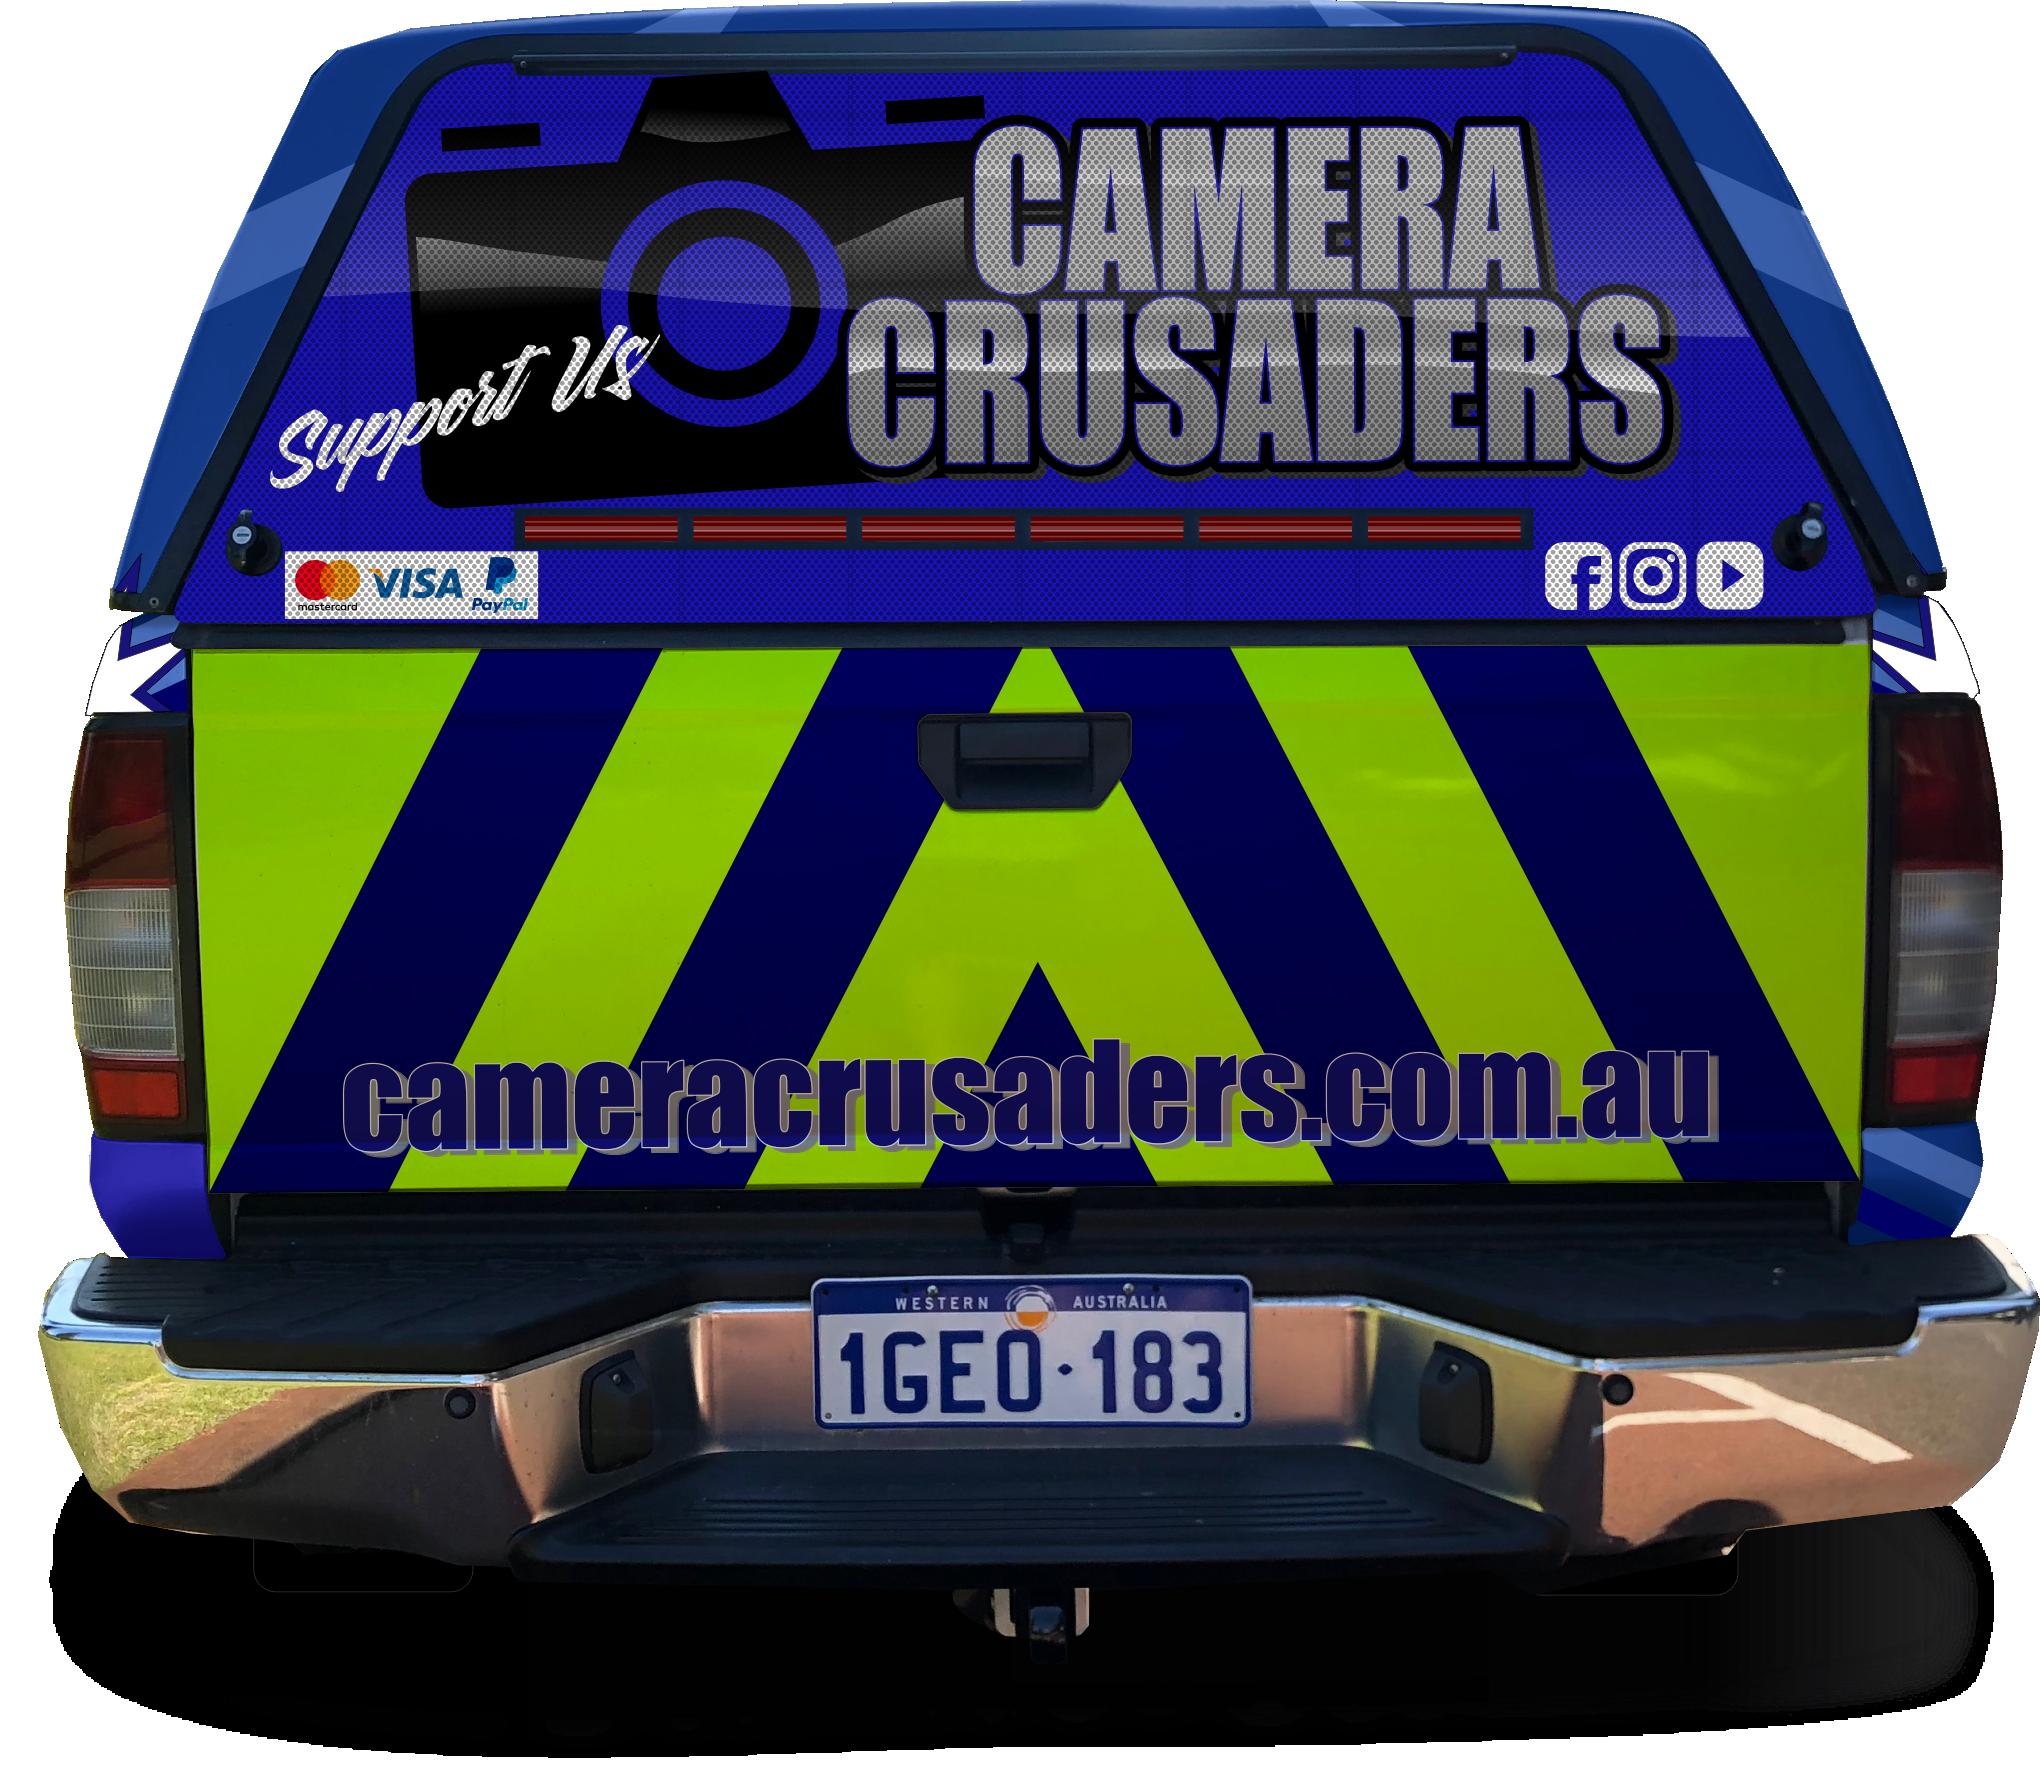 Vehicle Vinyl Wrap Design - Speeding Camera Resistance Group